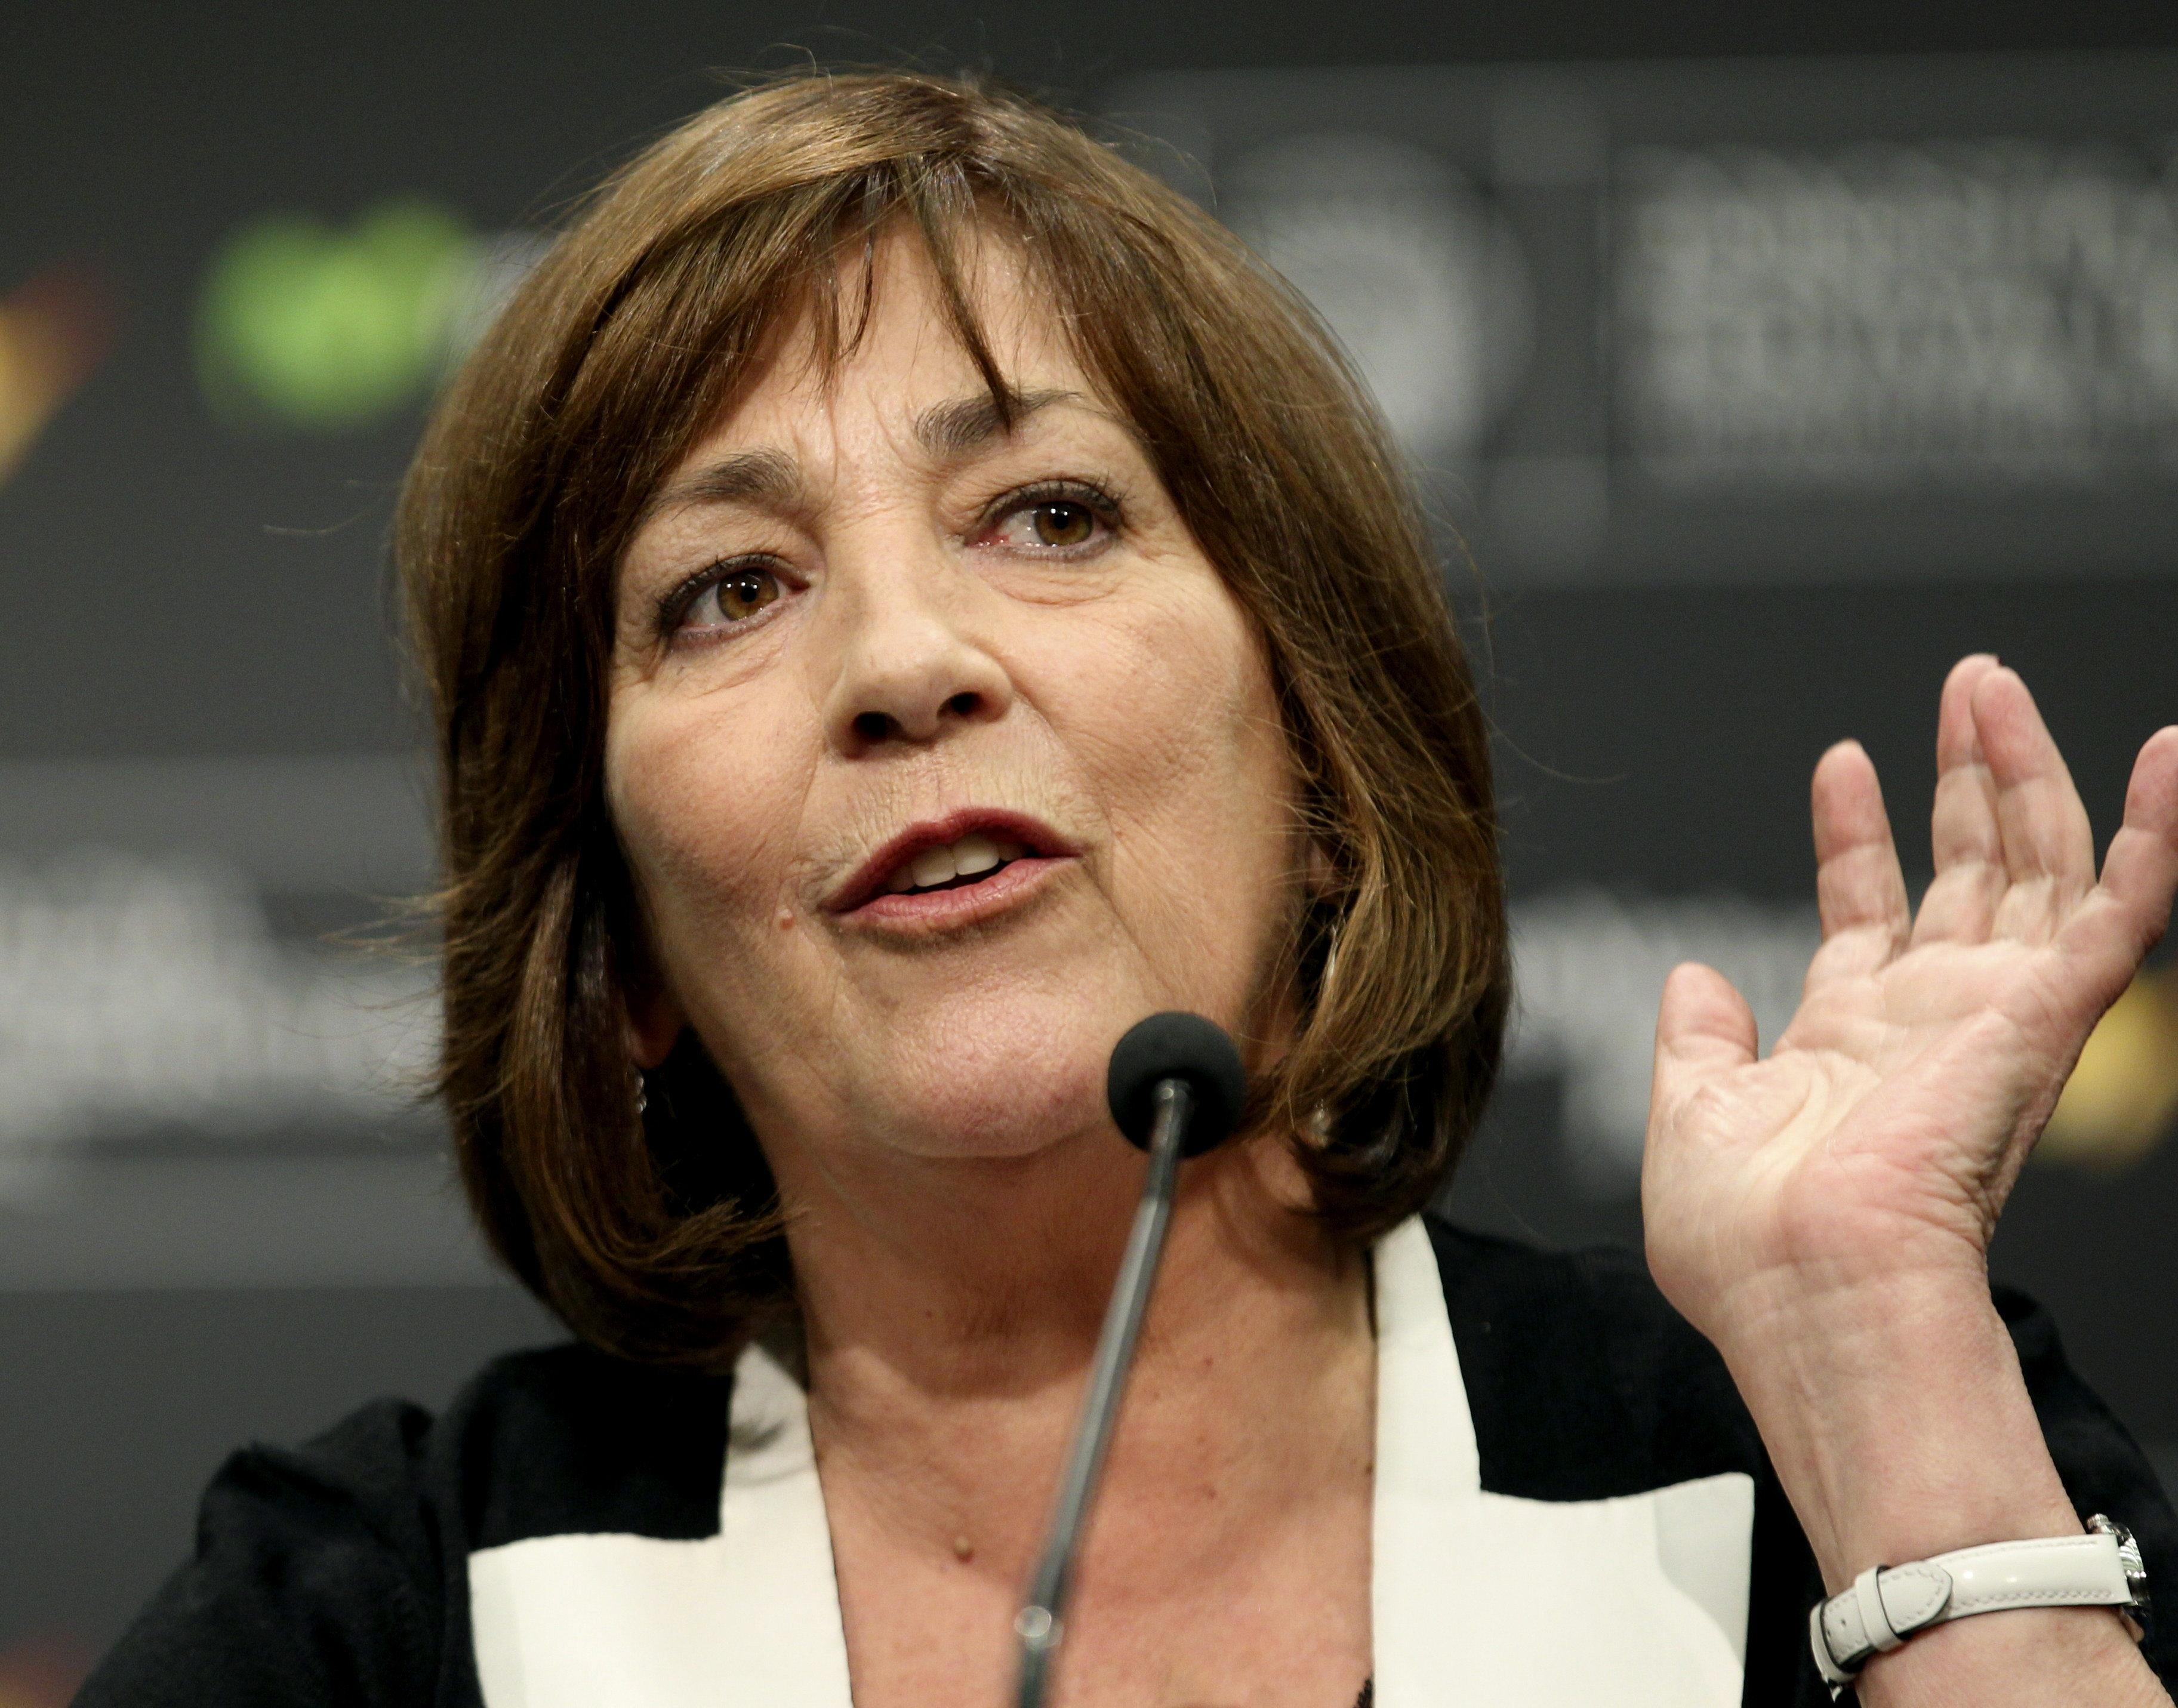 Carmen Maura asegura que «de su vida profesional no quita nada»